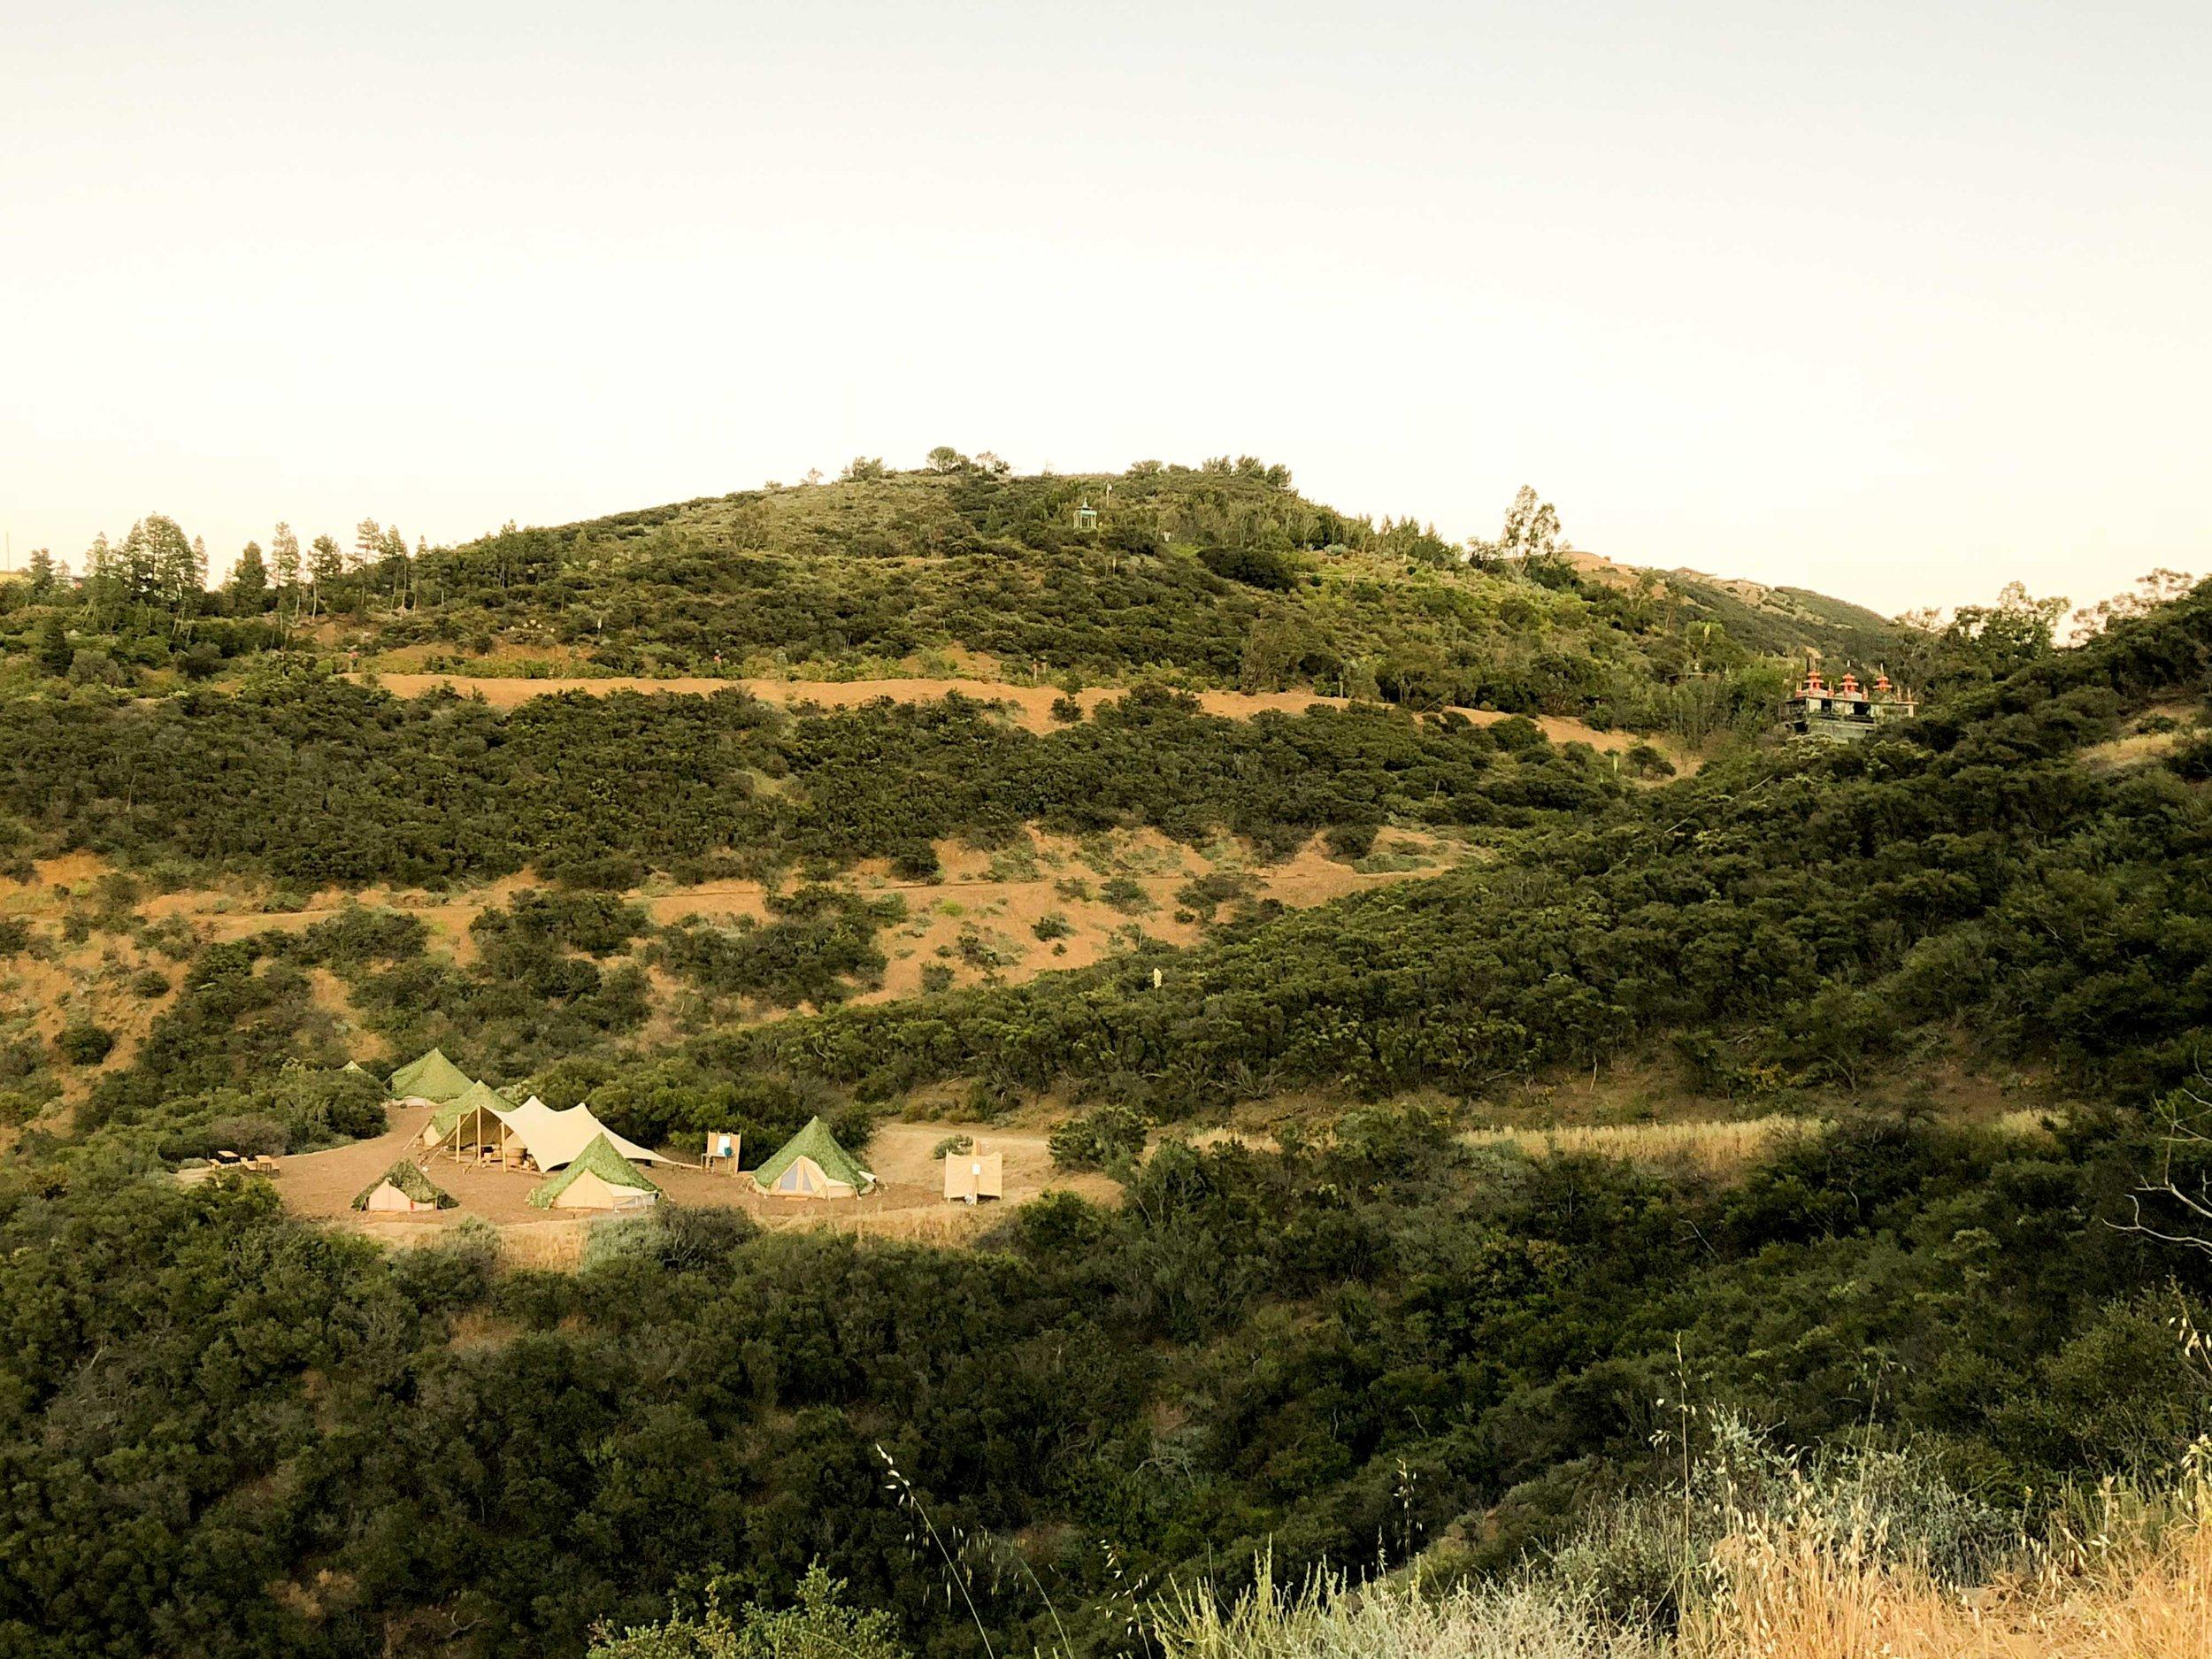 S.E.A.-Studio-Environmental-Architecture-David-Hertz-FAIA-Tony-Duquette-Xanabu-Malibu-California-adaptive-reuse-sustainable-regenerative-restorative-green-design-airplane-upcycle-recycle-found-object-historic-preservation-Hollywood-set-bony-ridge-5.jpg